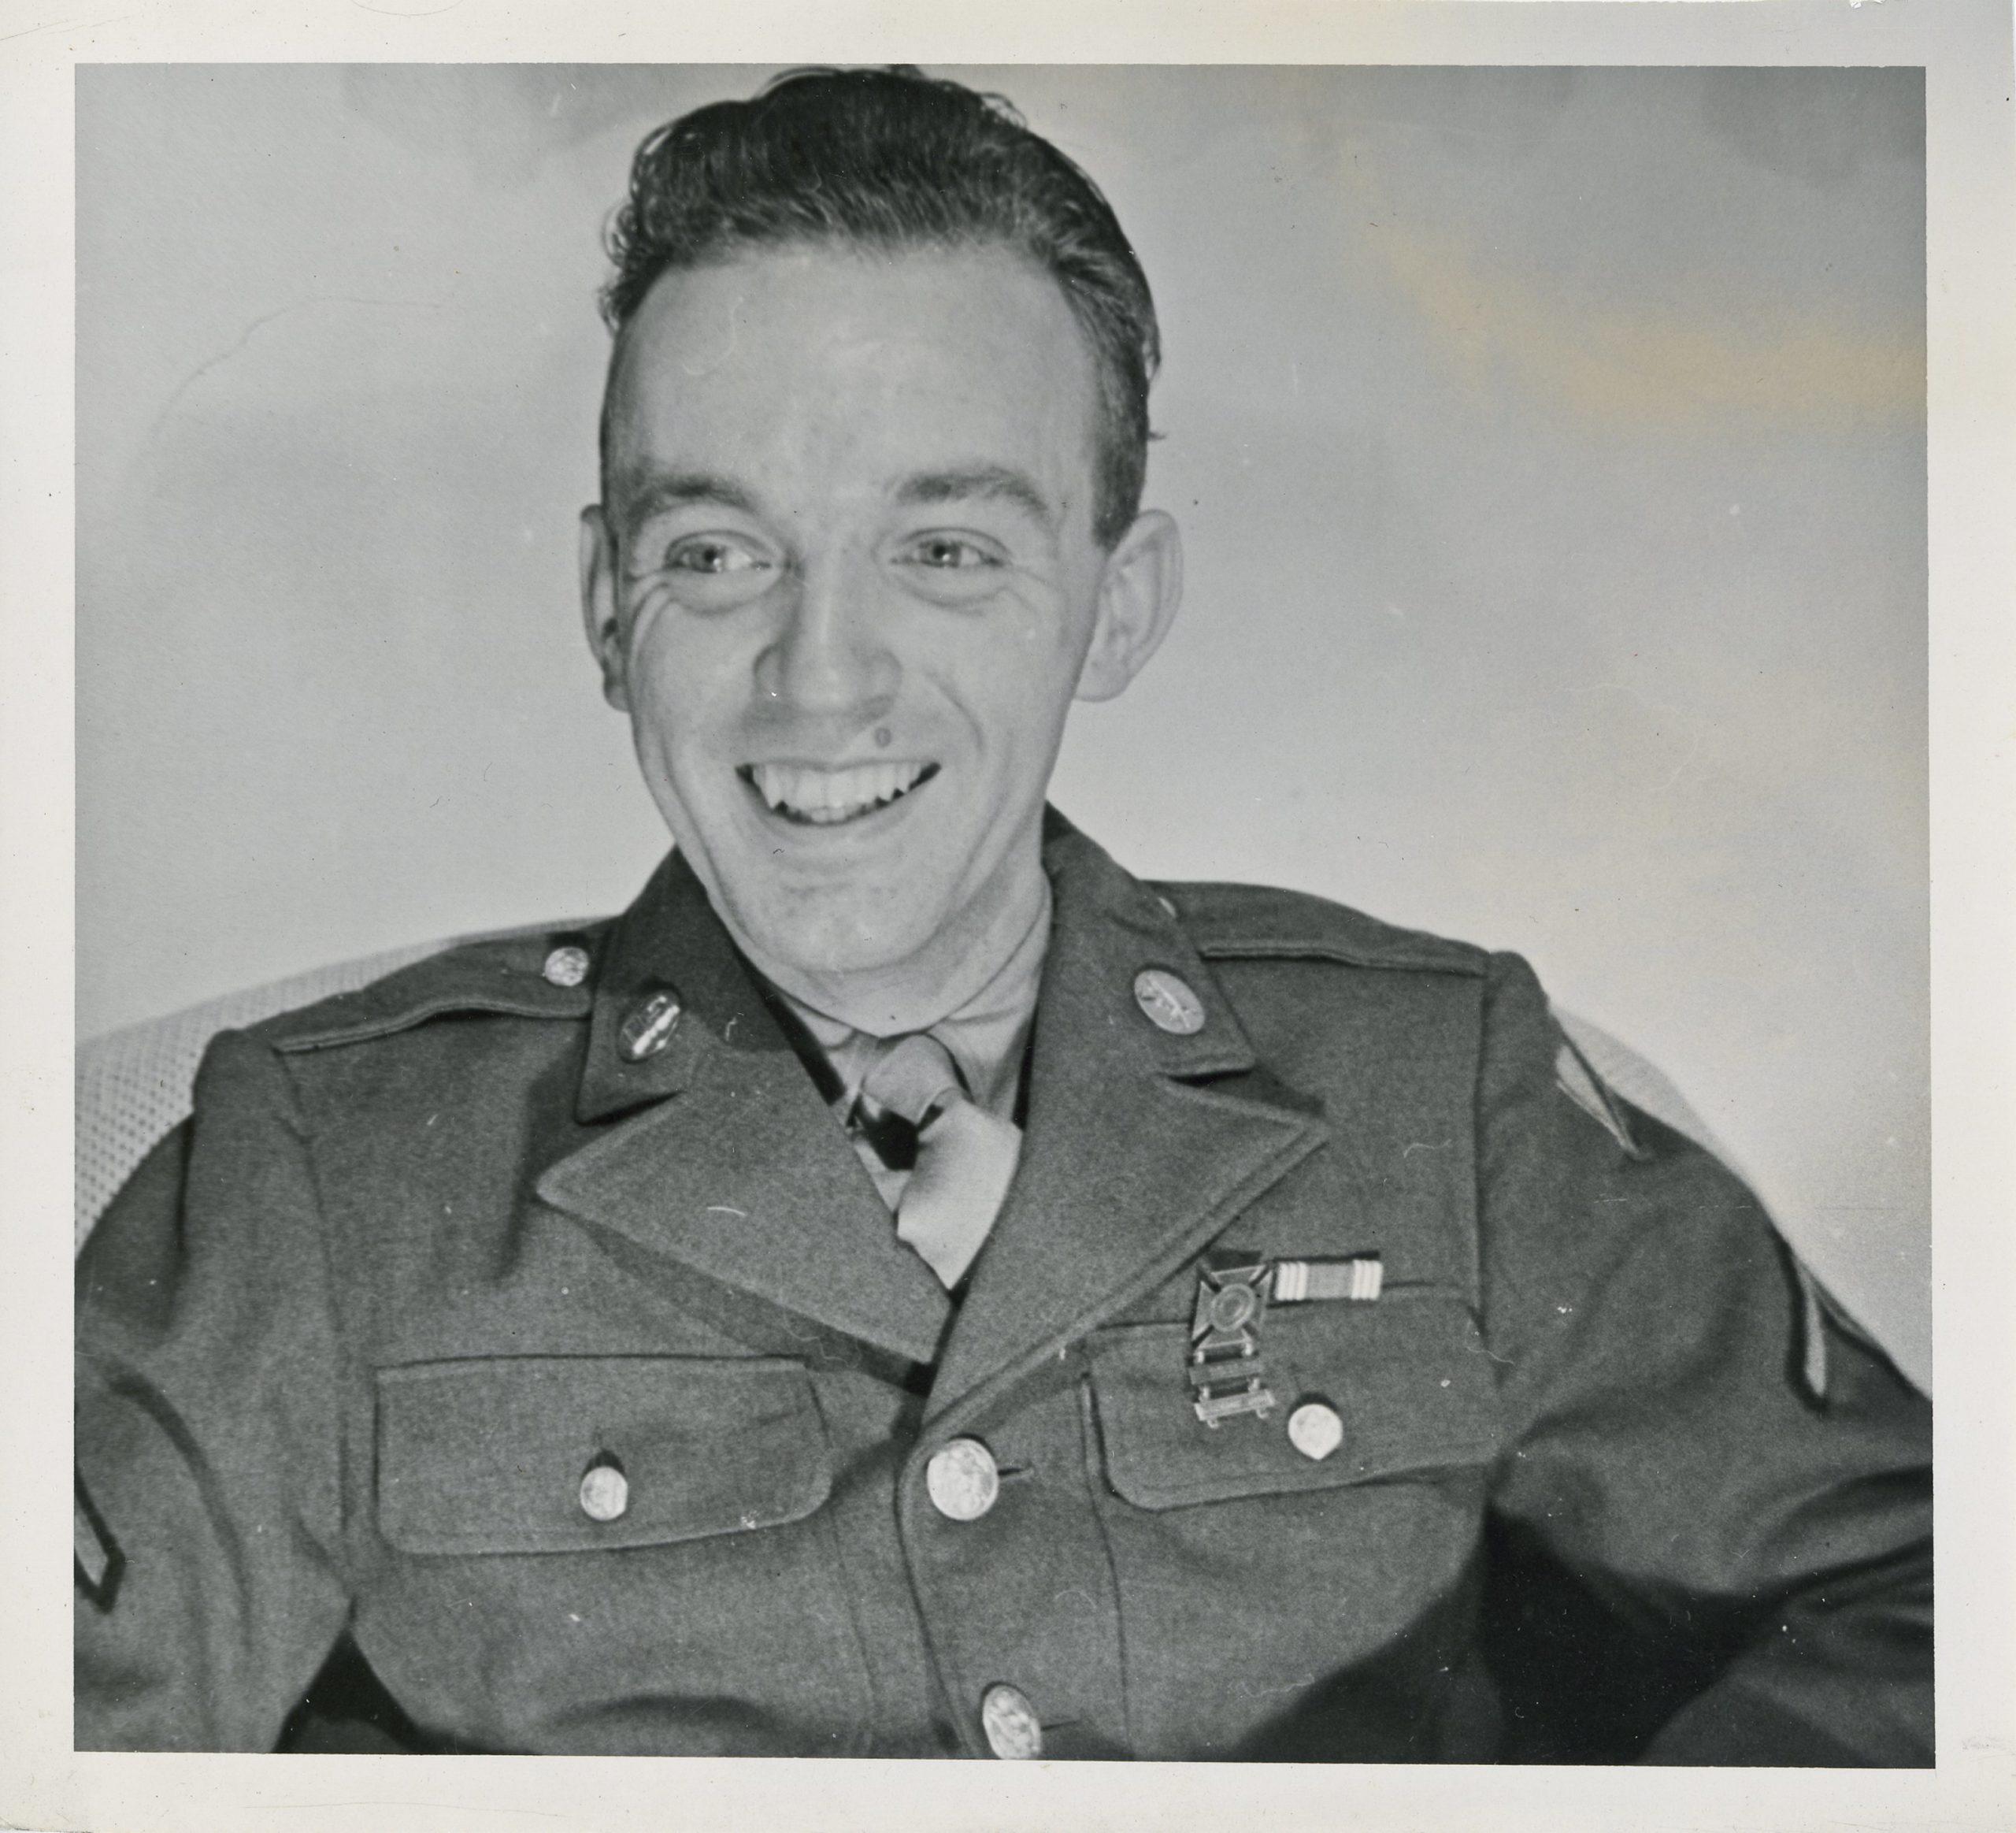 Um jovem soldado americano sorri.